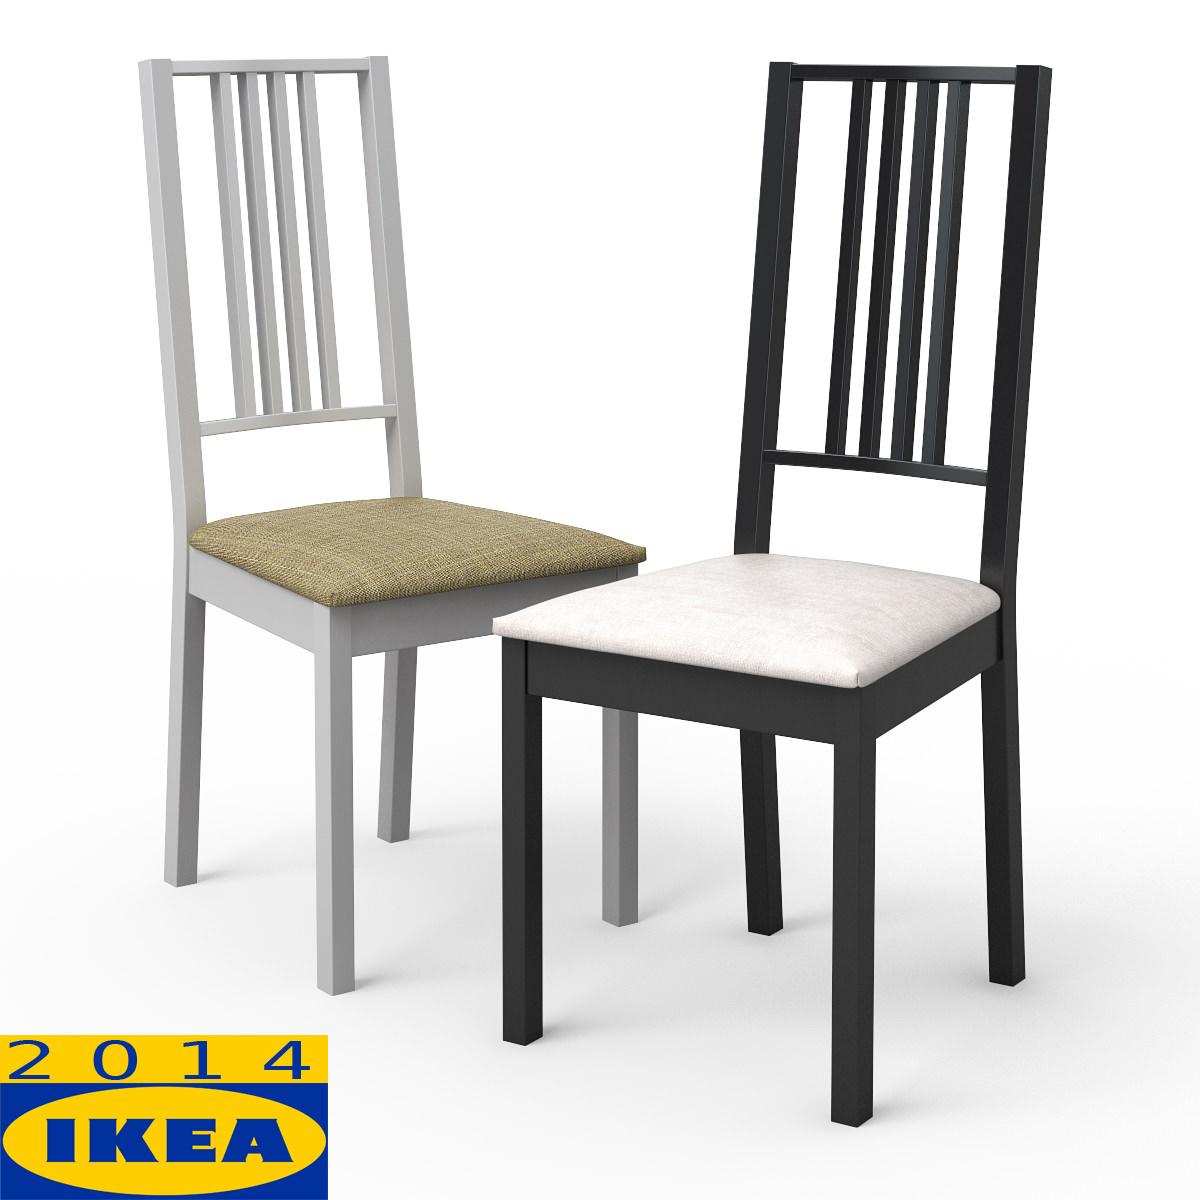 BORJE Dining chair 3D Model max obj 3ds fbx CGTradercom : borjediningchair3dmodel3dsfbxobjmaxc18cd3e4 4496 4d57 9ebf f59869124a54 from cgtrader.com size 1200 x 1200 jpeg 125kB